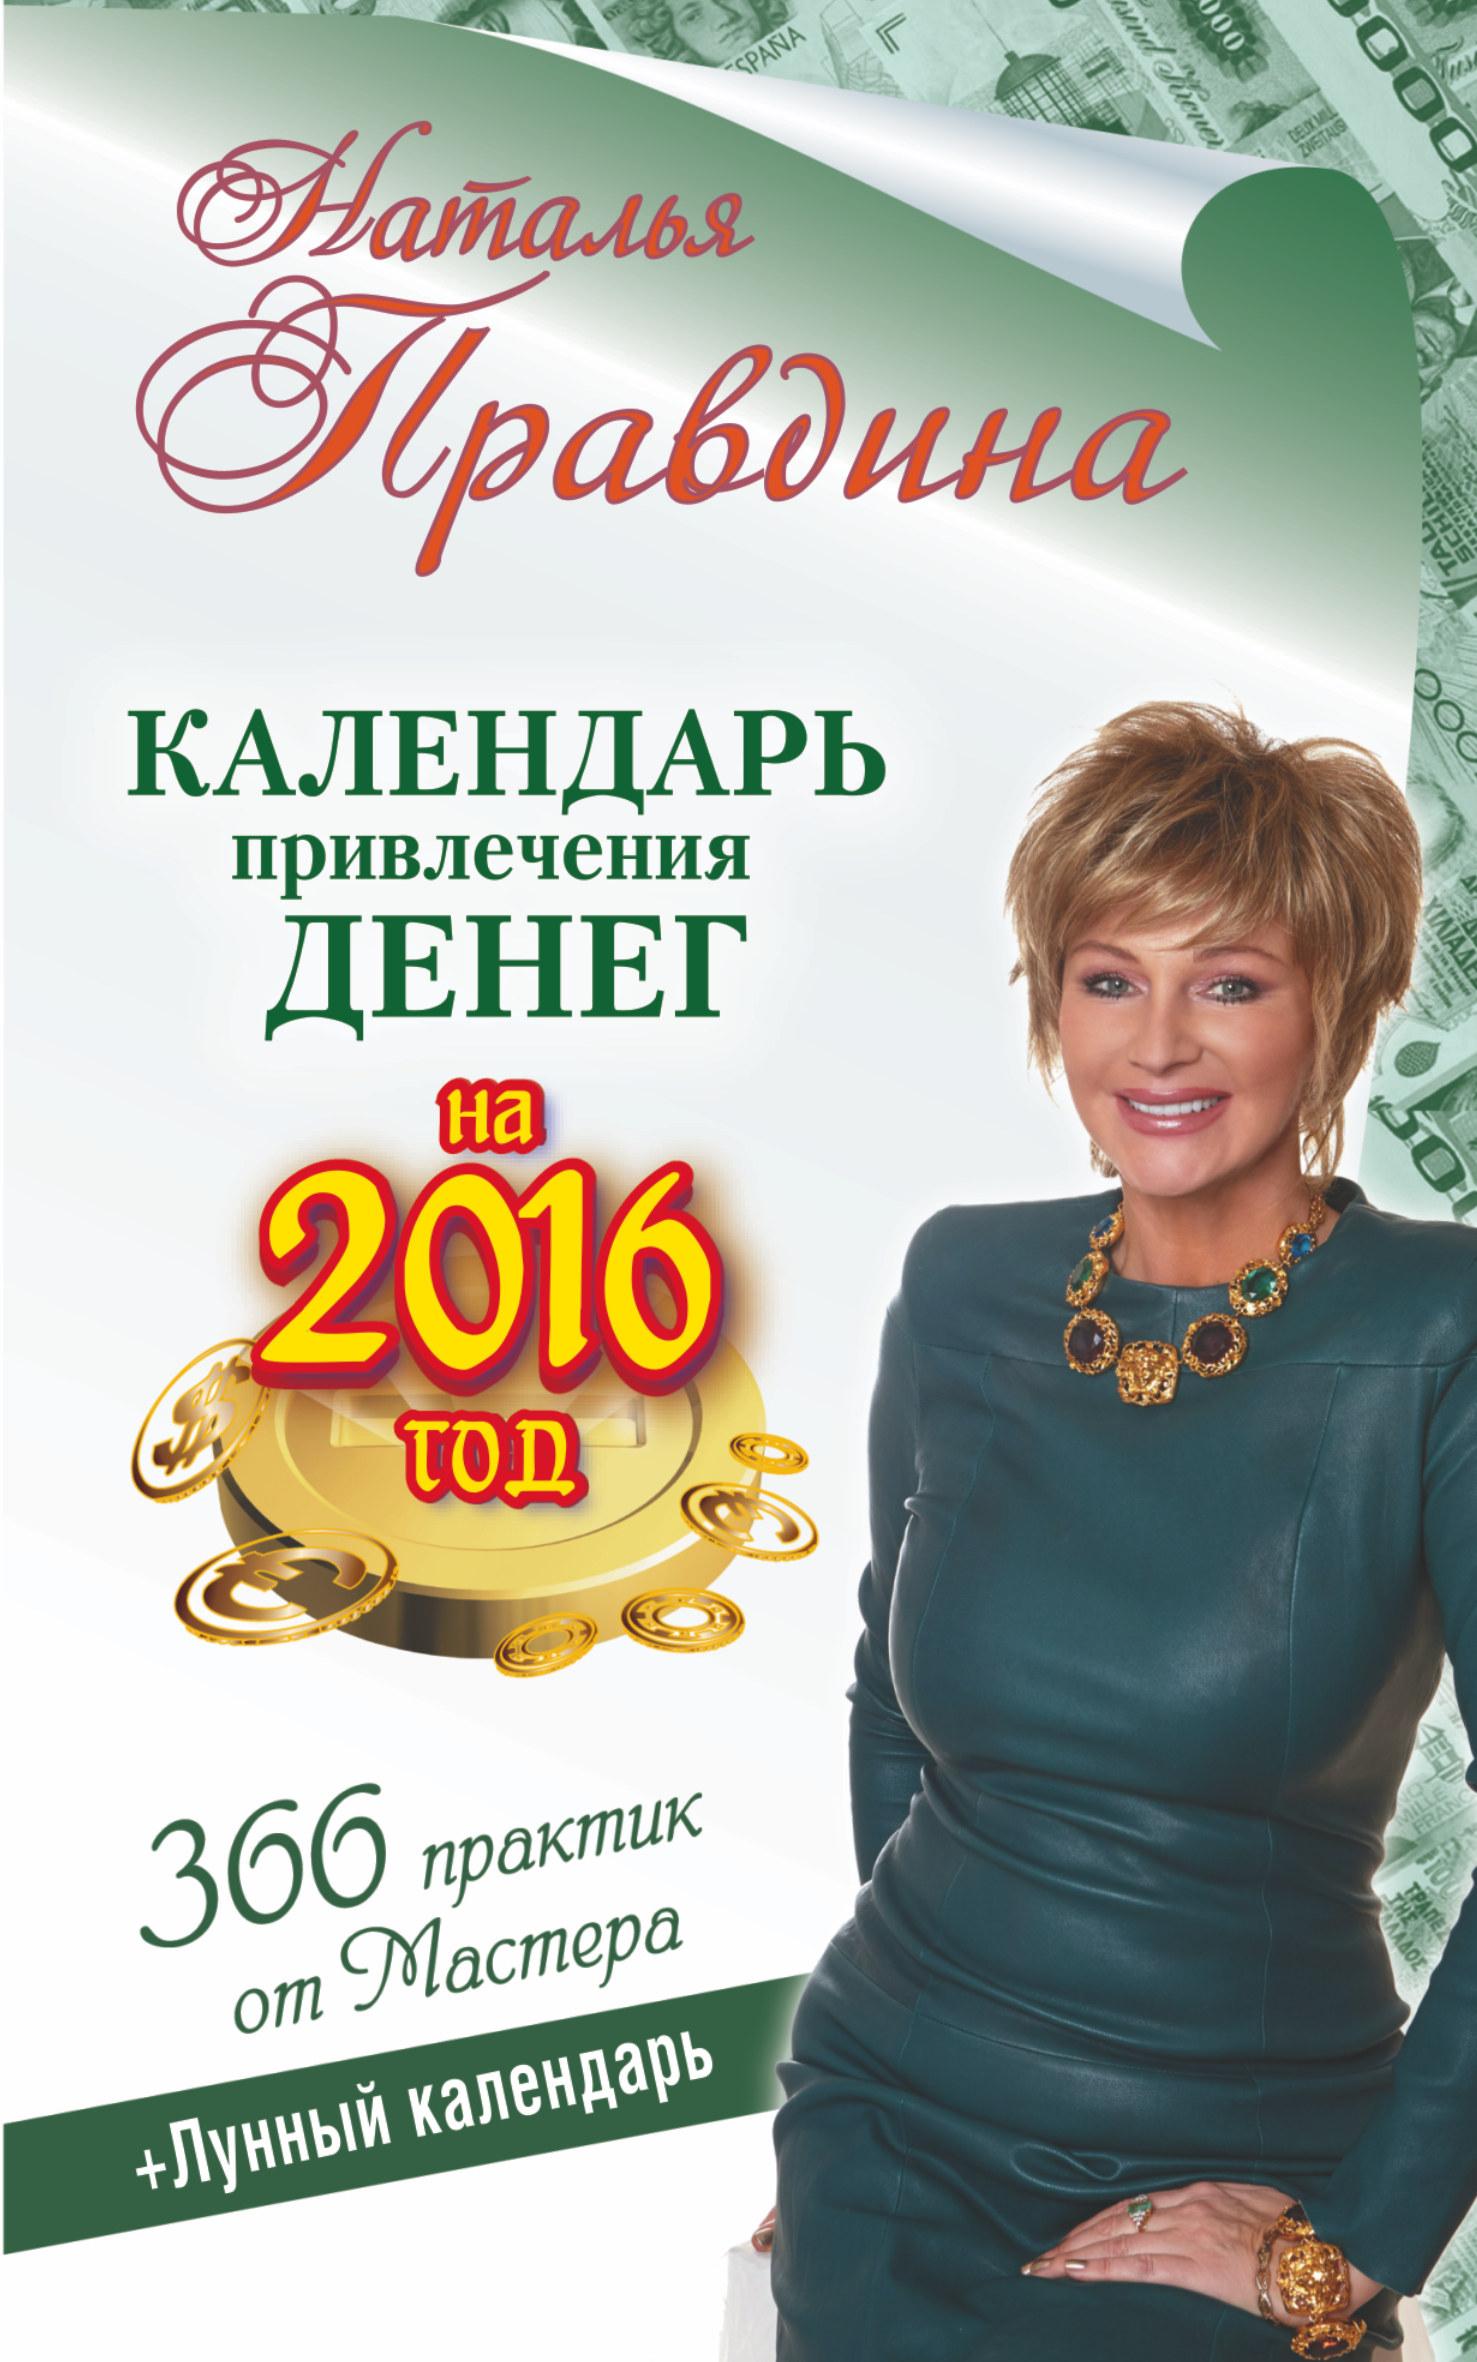 Календарь привлечения денег на 2016 год. 366 практик от Мастера. Лунный календарь